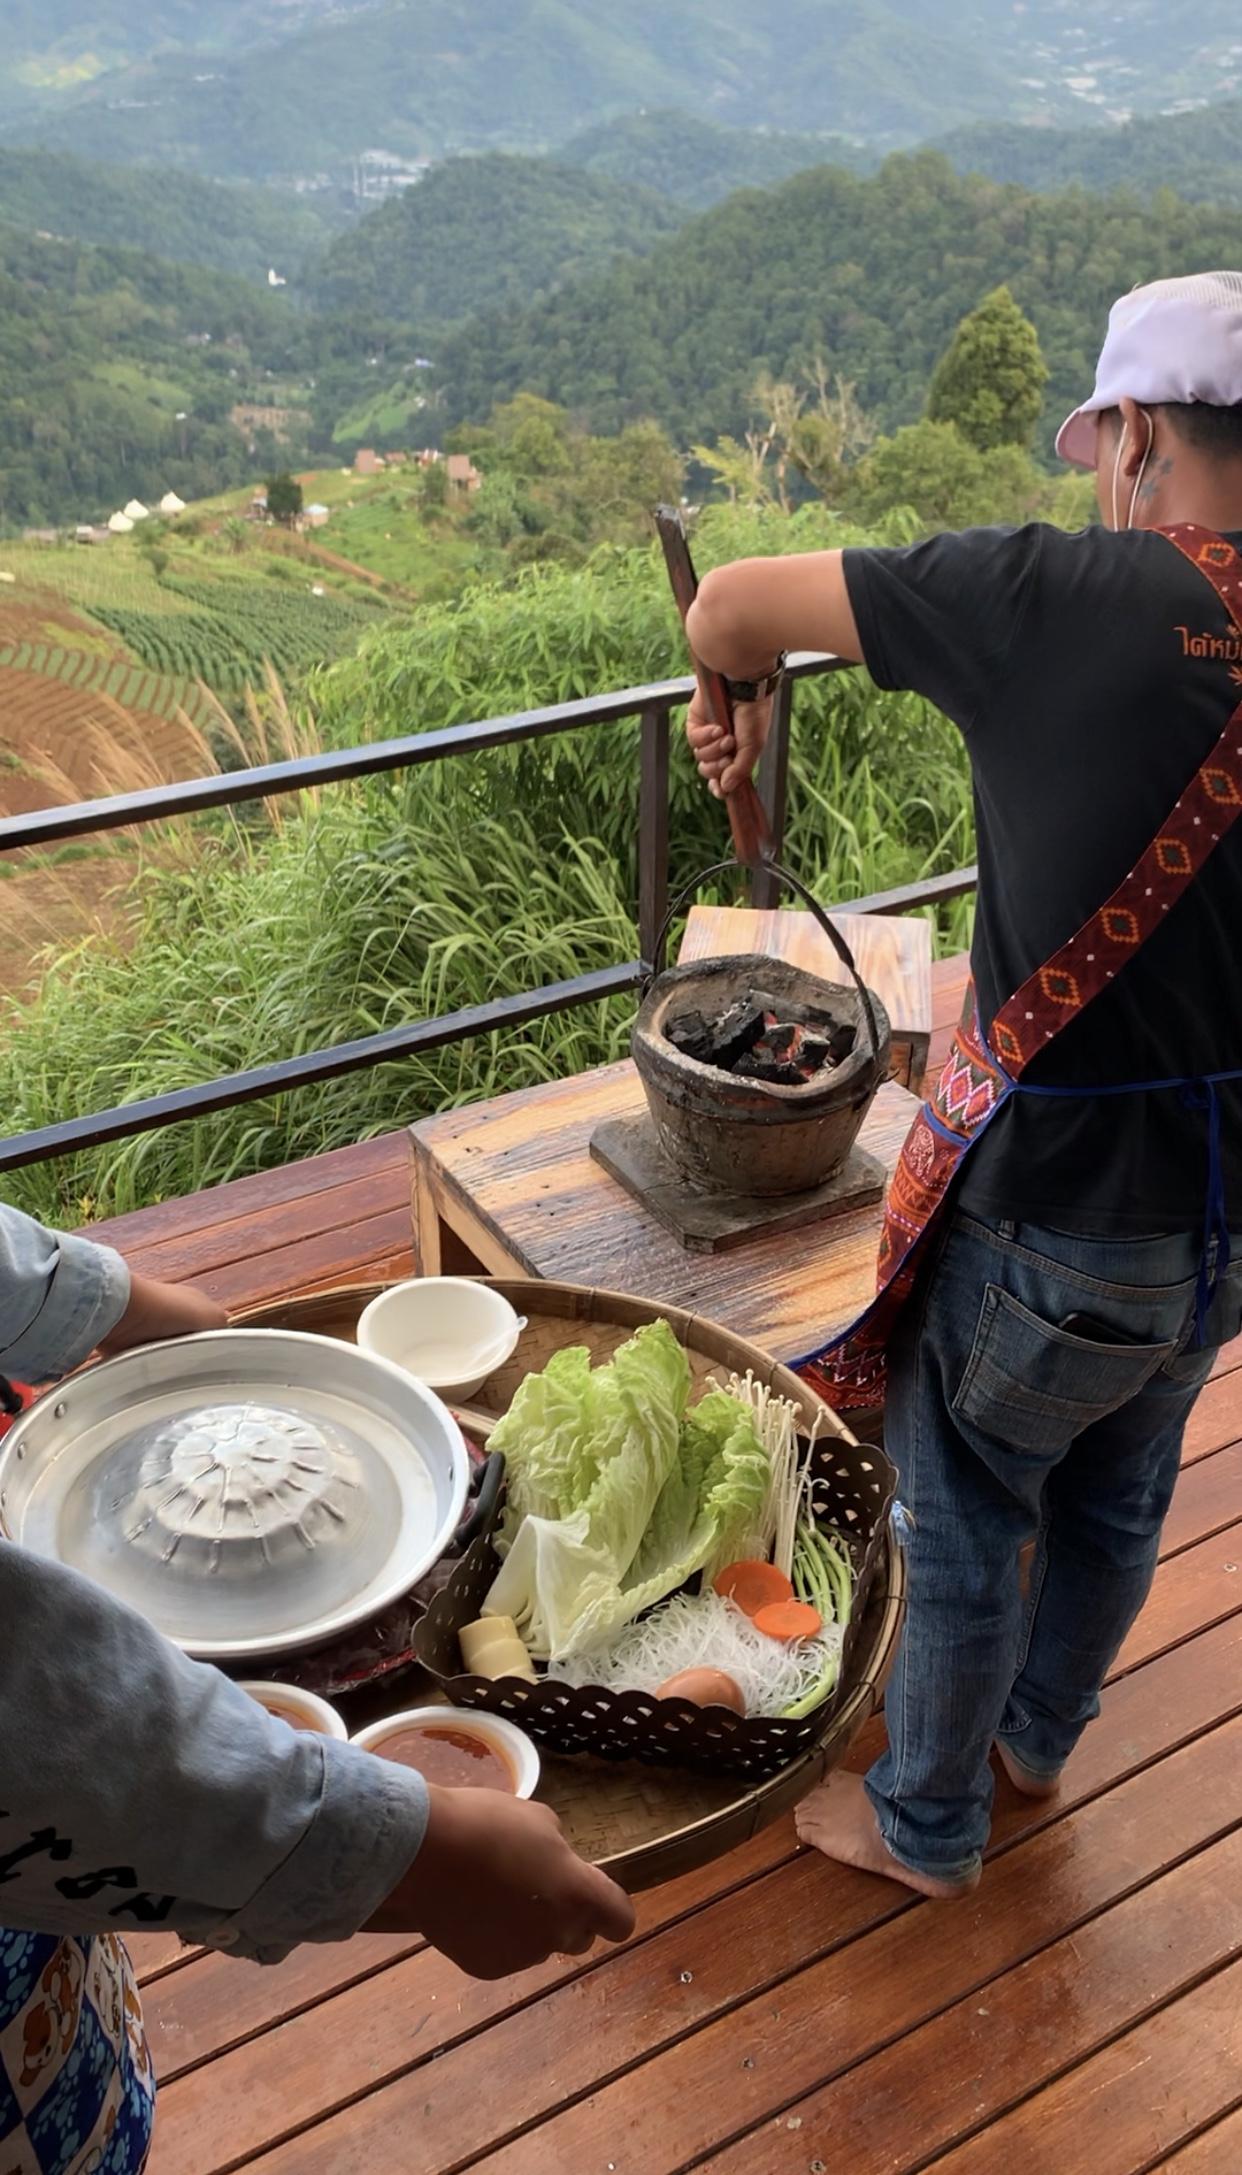 Mon Jam Chiang Mai